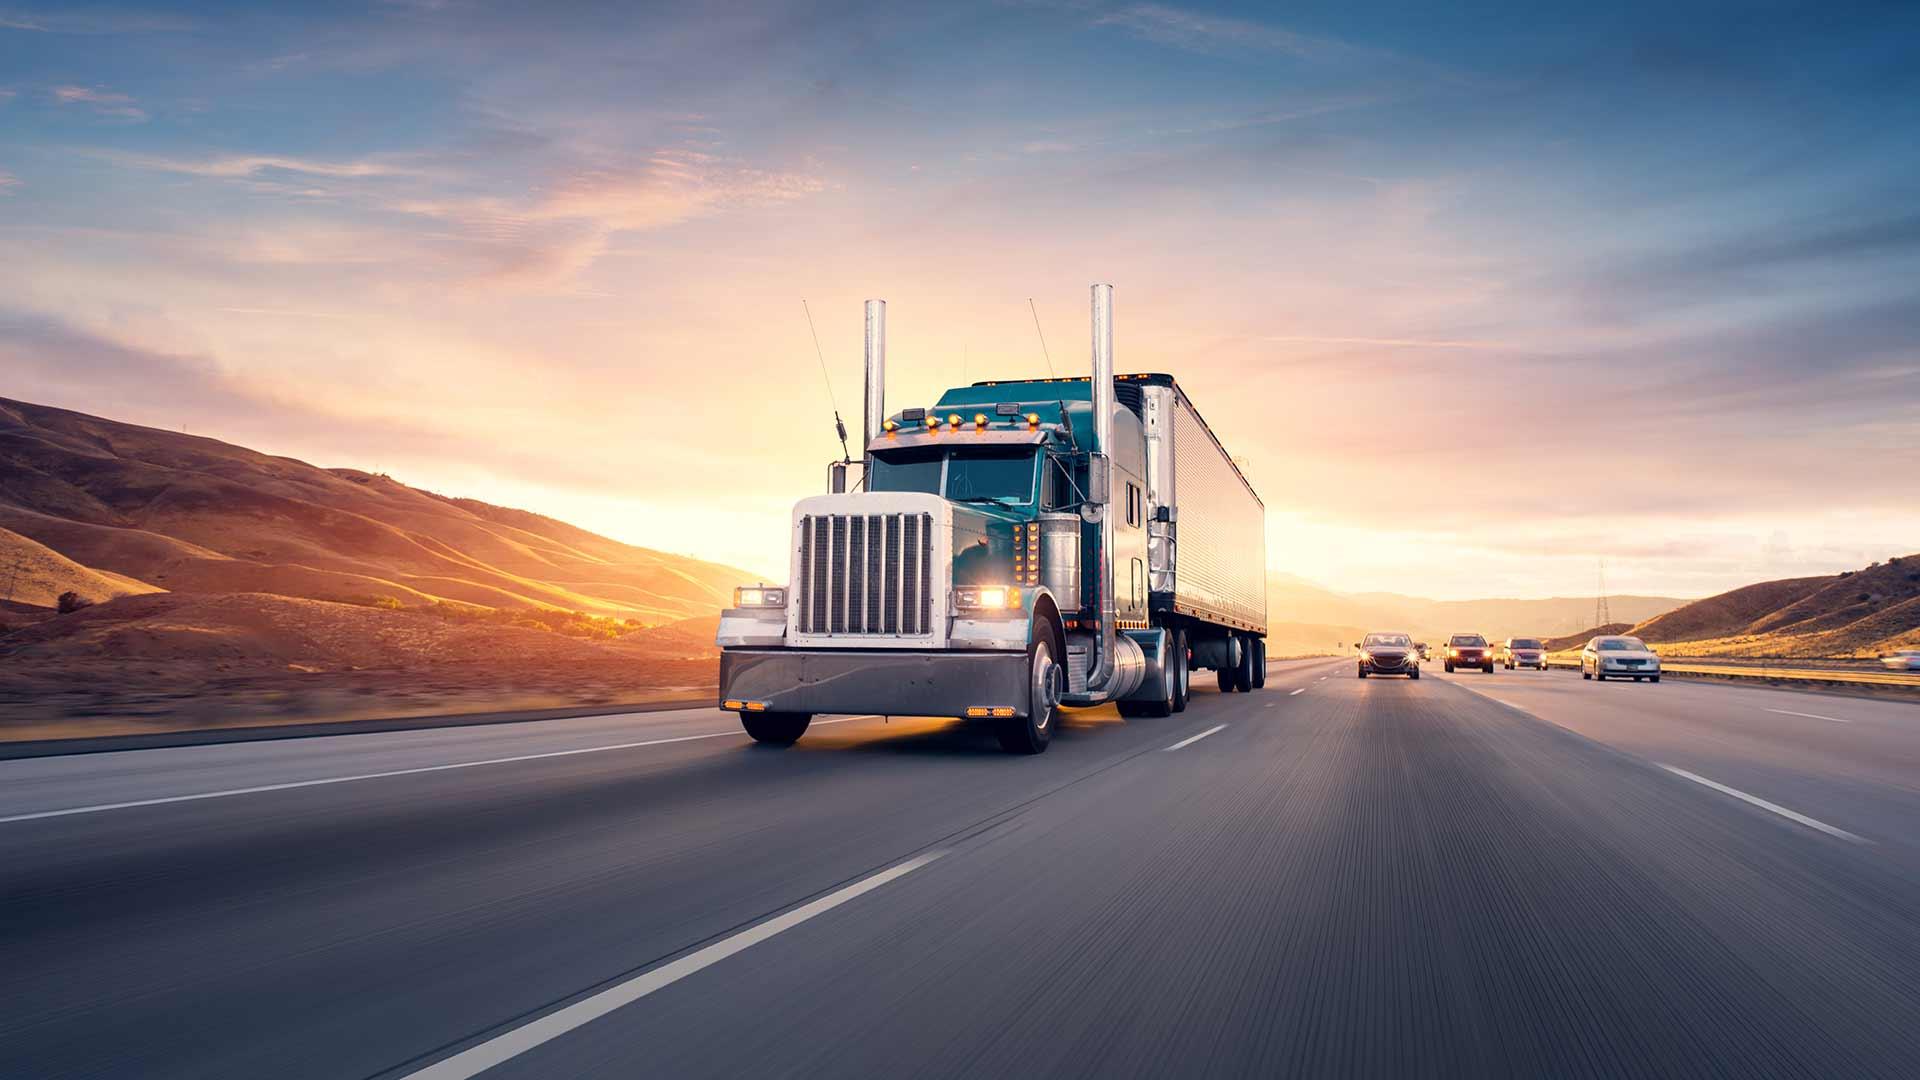 BackShield Back Support for Truck Drivers